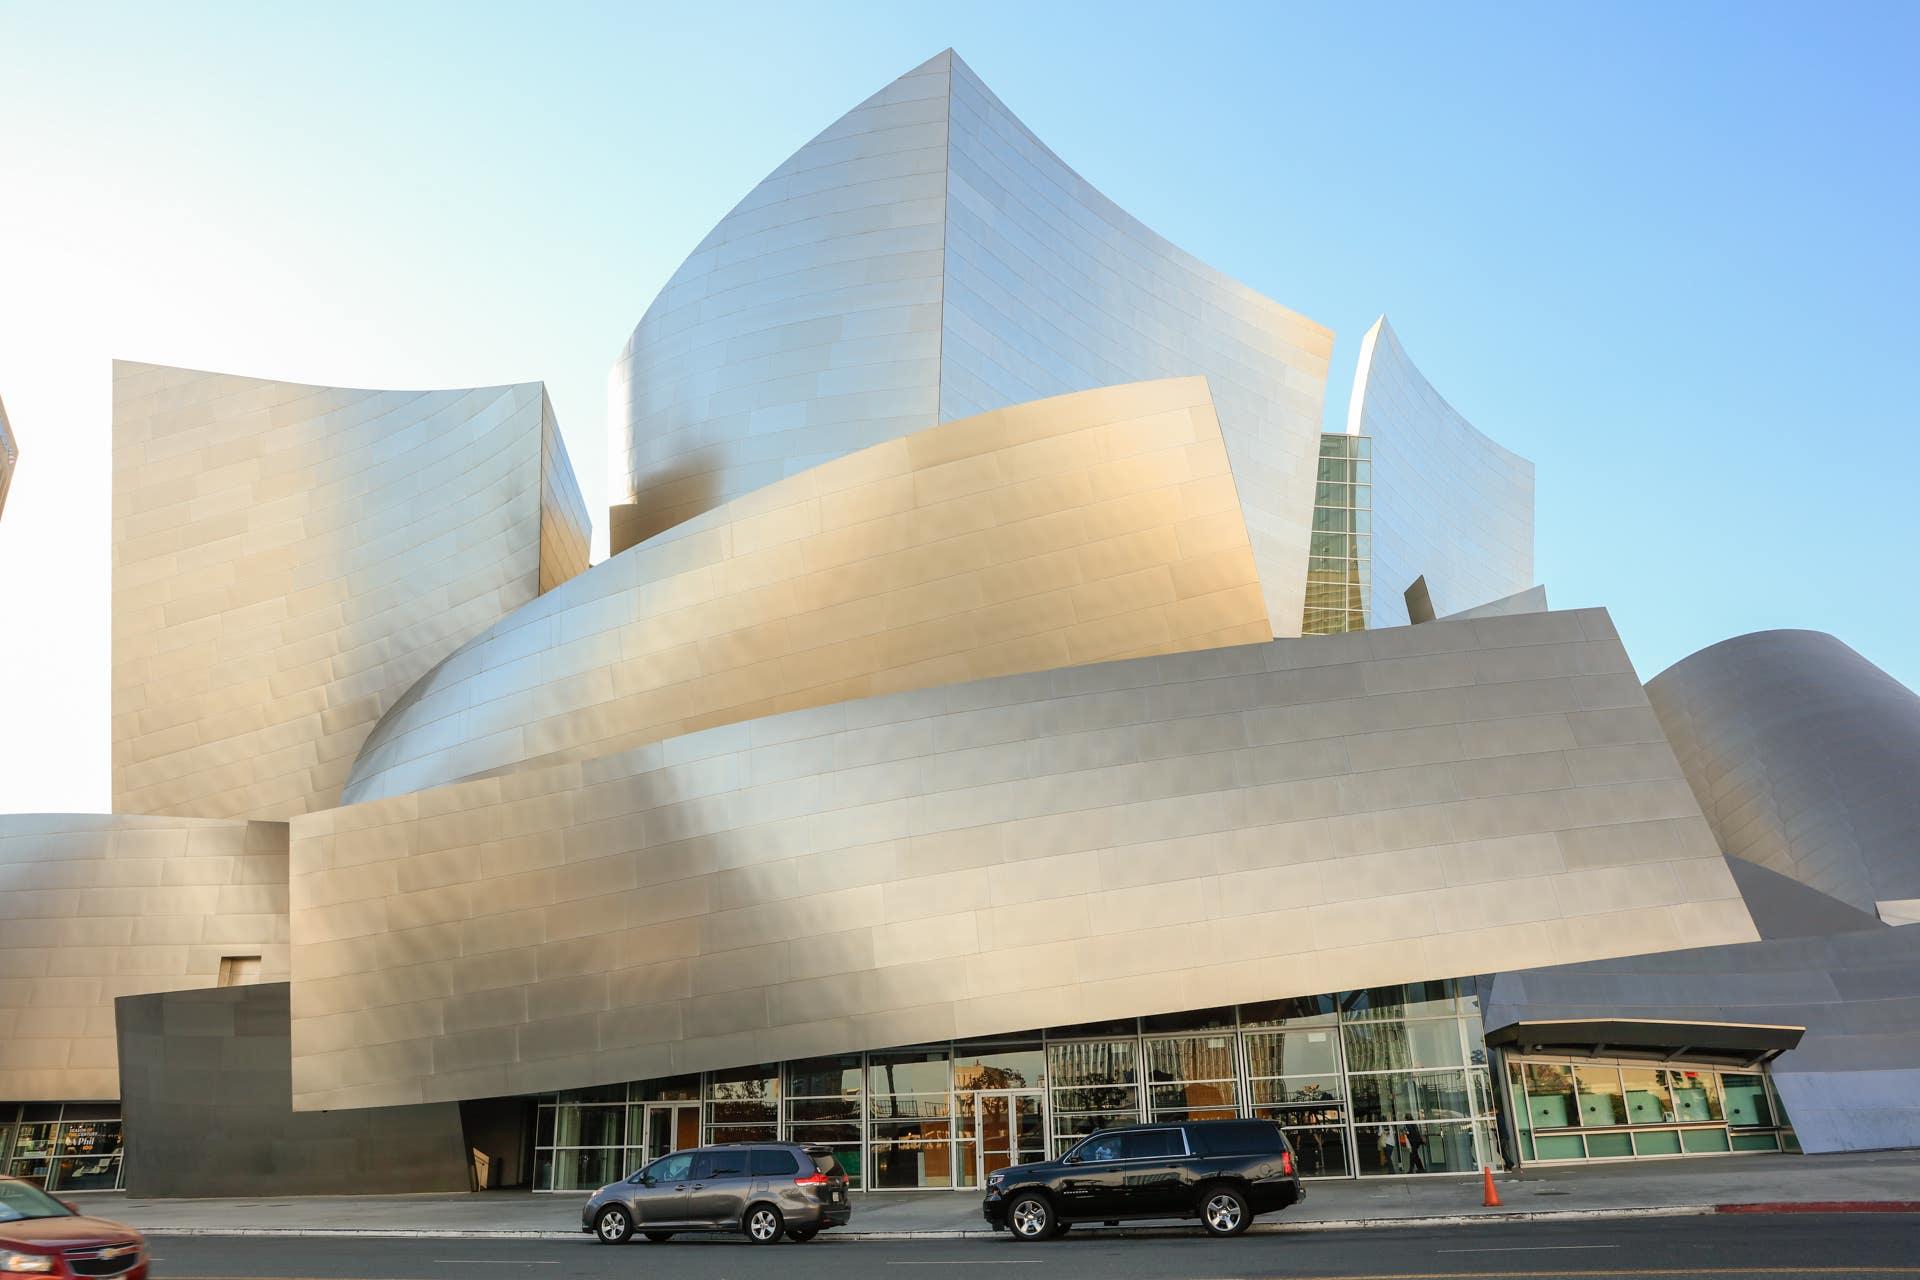 The exterior of Walt Disney Concert Hall